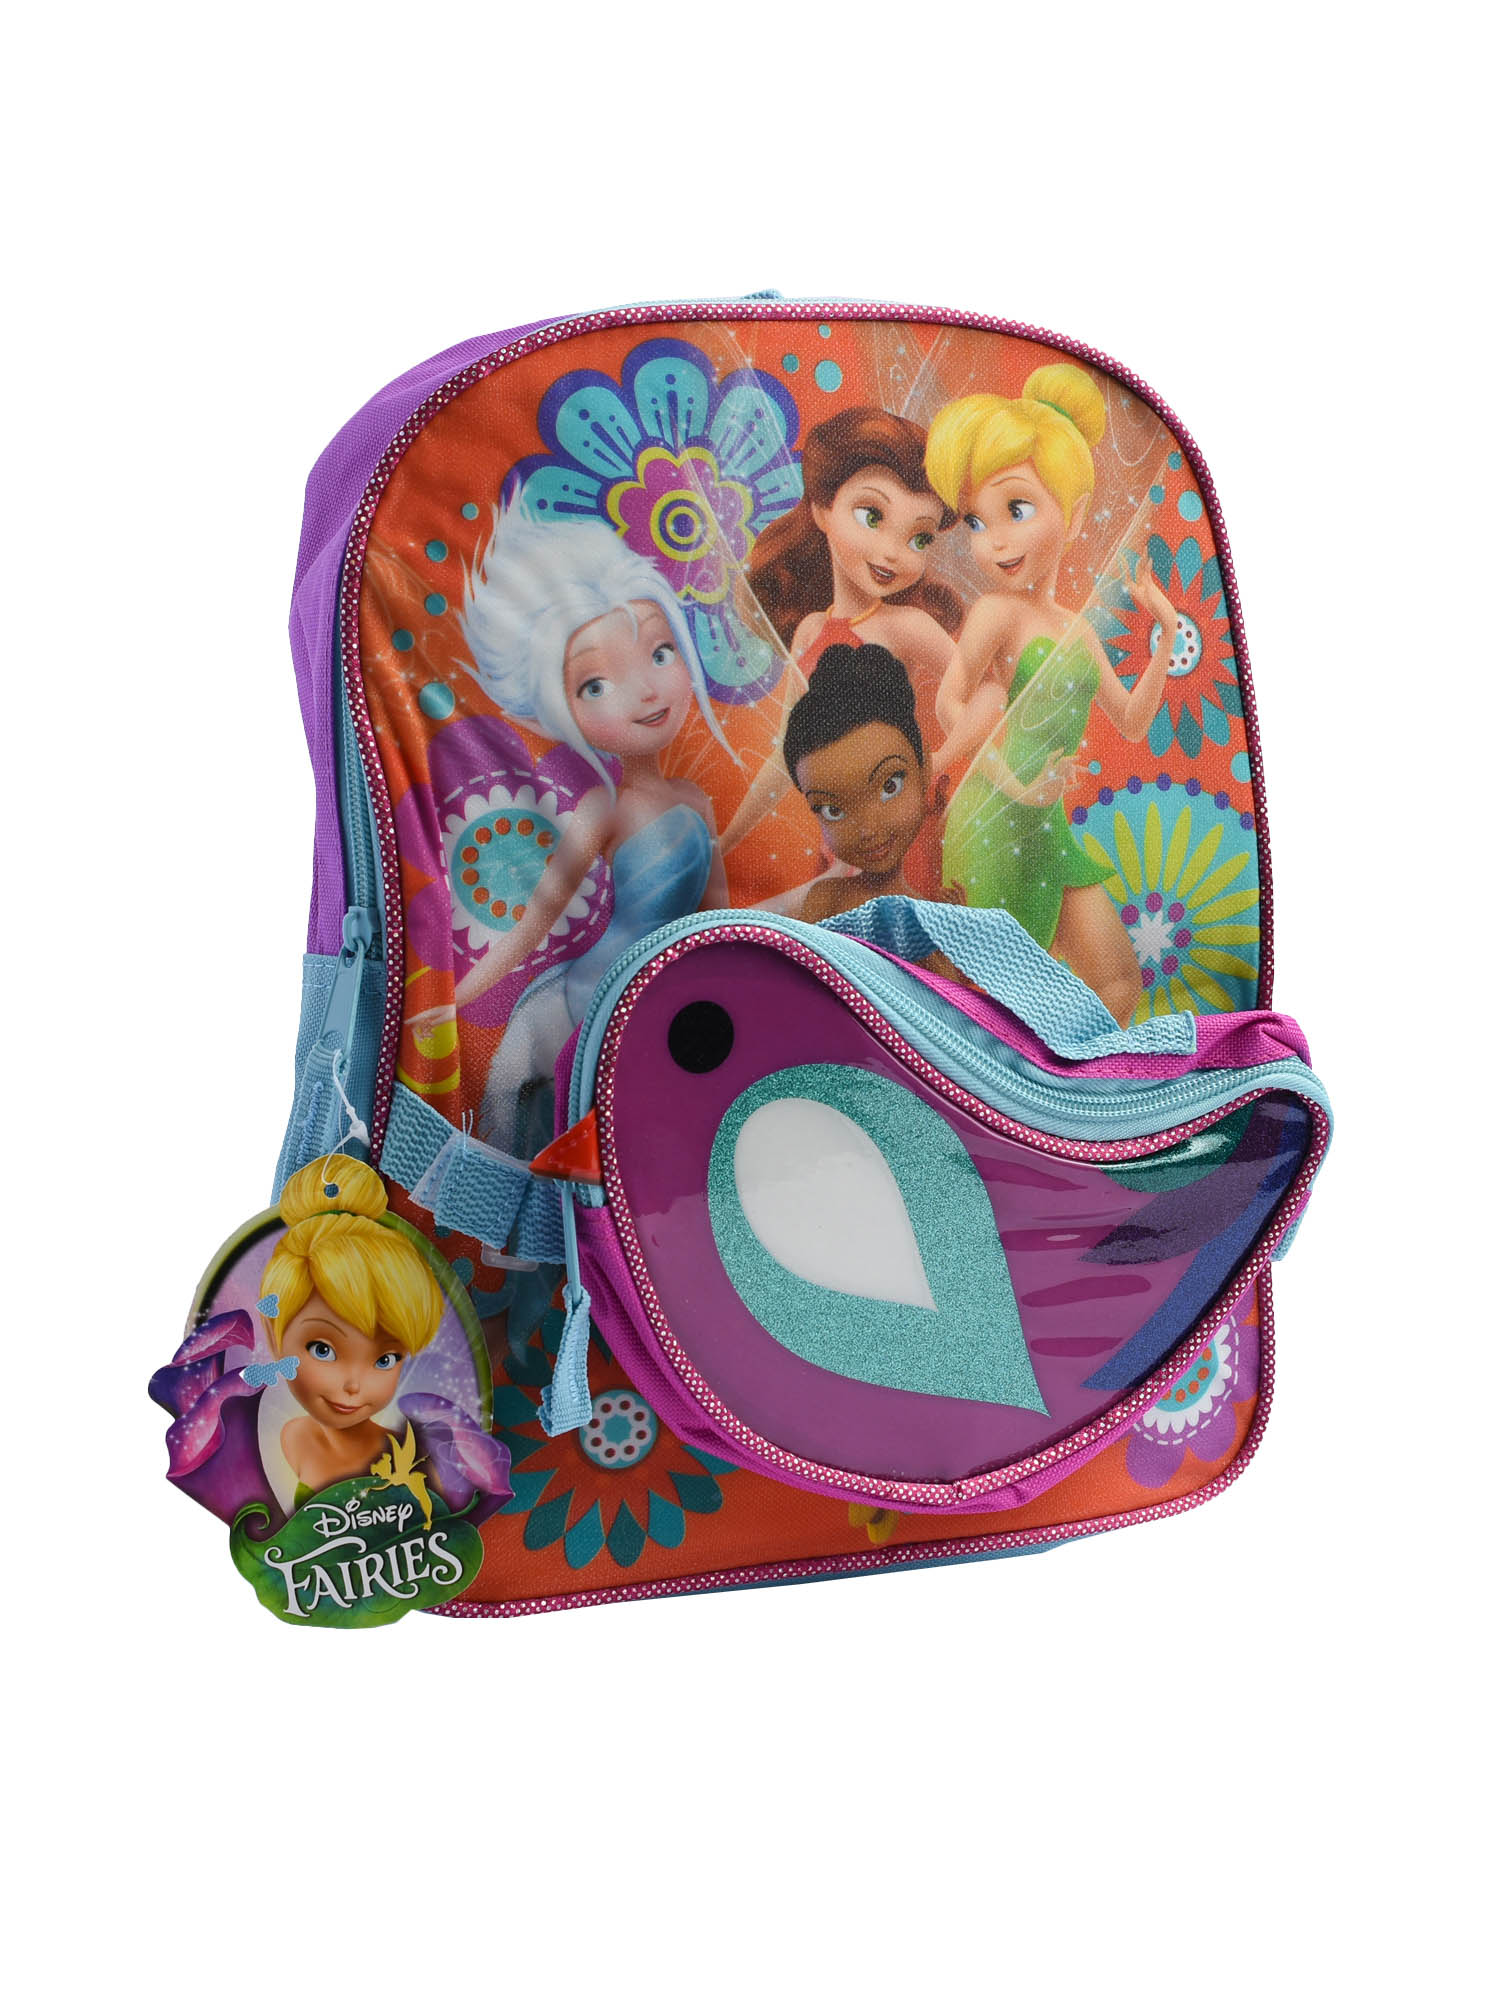 "Girls Tinkerbell Fairies 12"" Backpack Detachable Snack Bag Rosetta Iridessa"